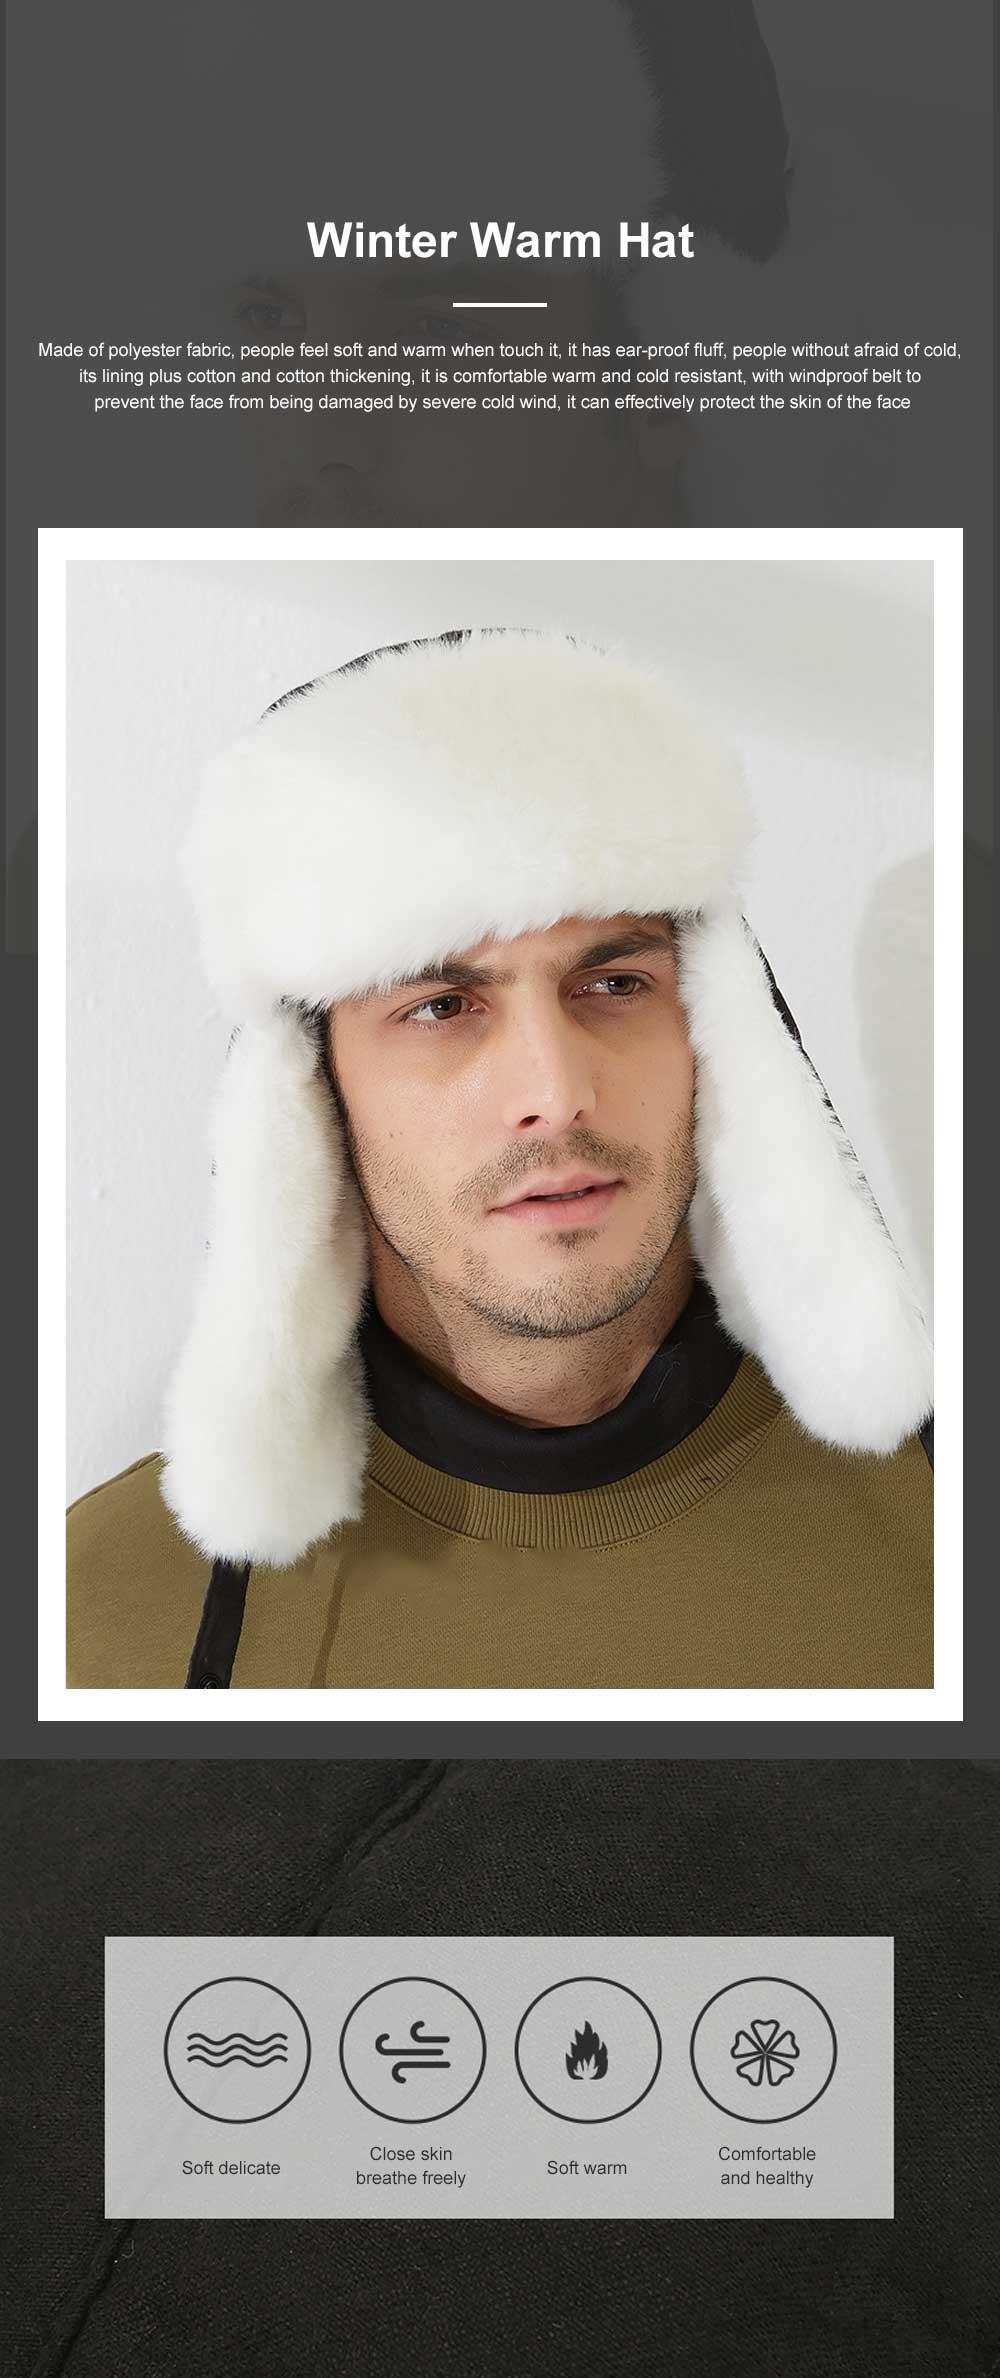 Winter Snow Hat Old Men Thickening Plus Velvet Warm Cap Plush Animal Cap Russian Style Faux Fur Hat With Ear Flaps Ski Earmuffs 0